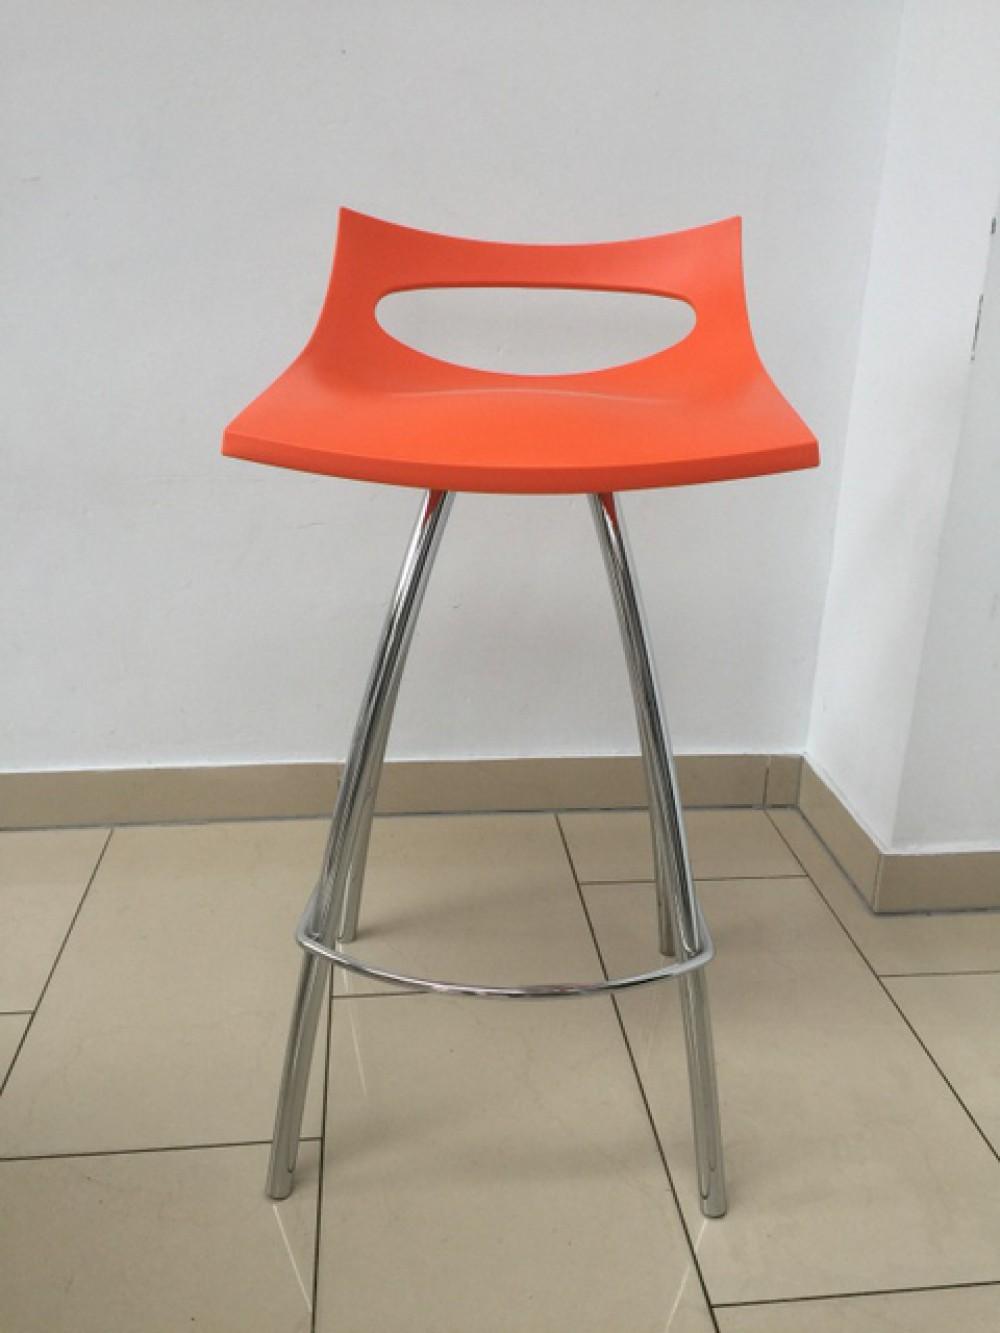 Barhocker Orange barhocker orange verchromtes gestell barstuhl orange sitzhöhe 65 cm